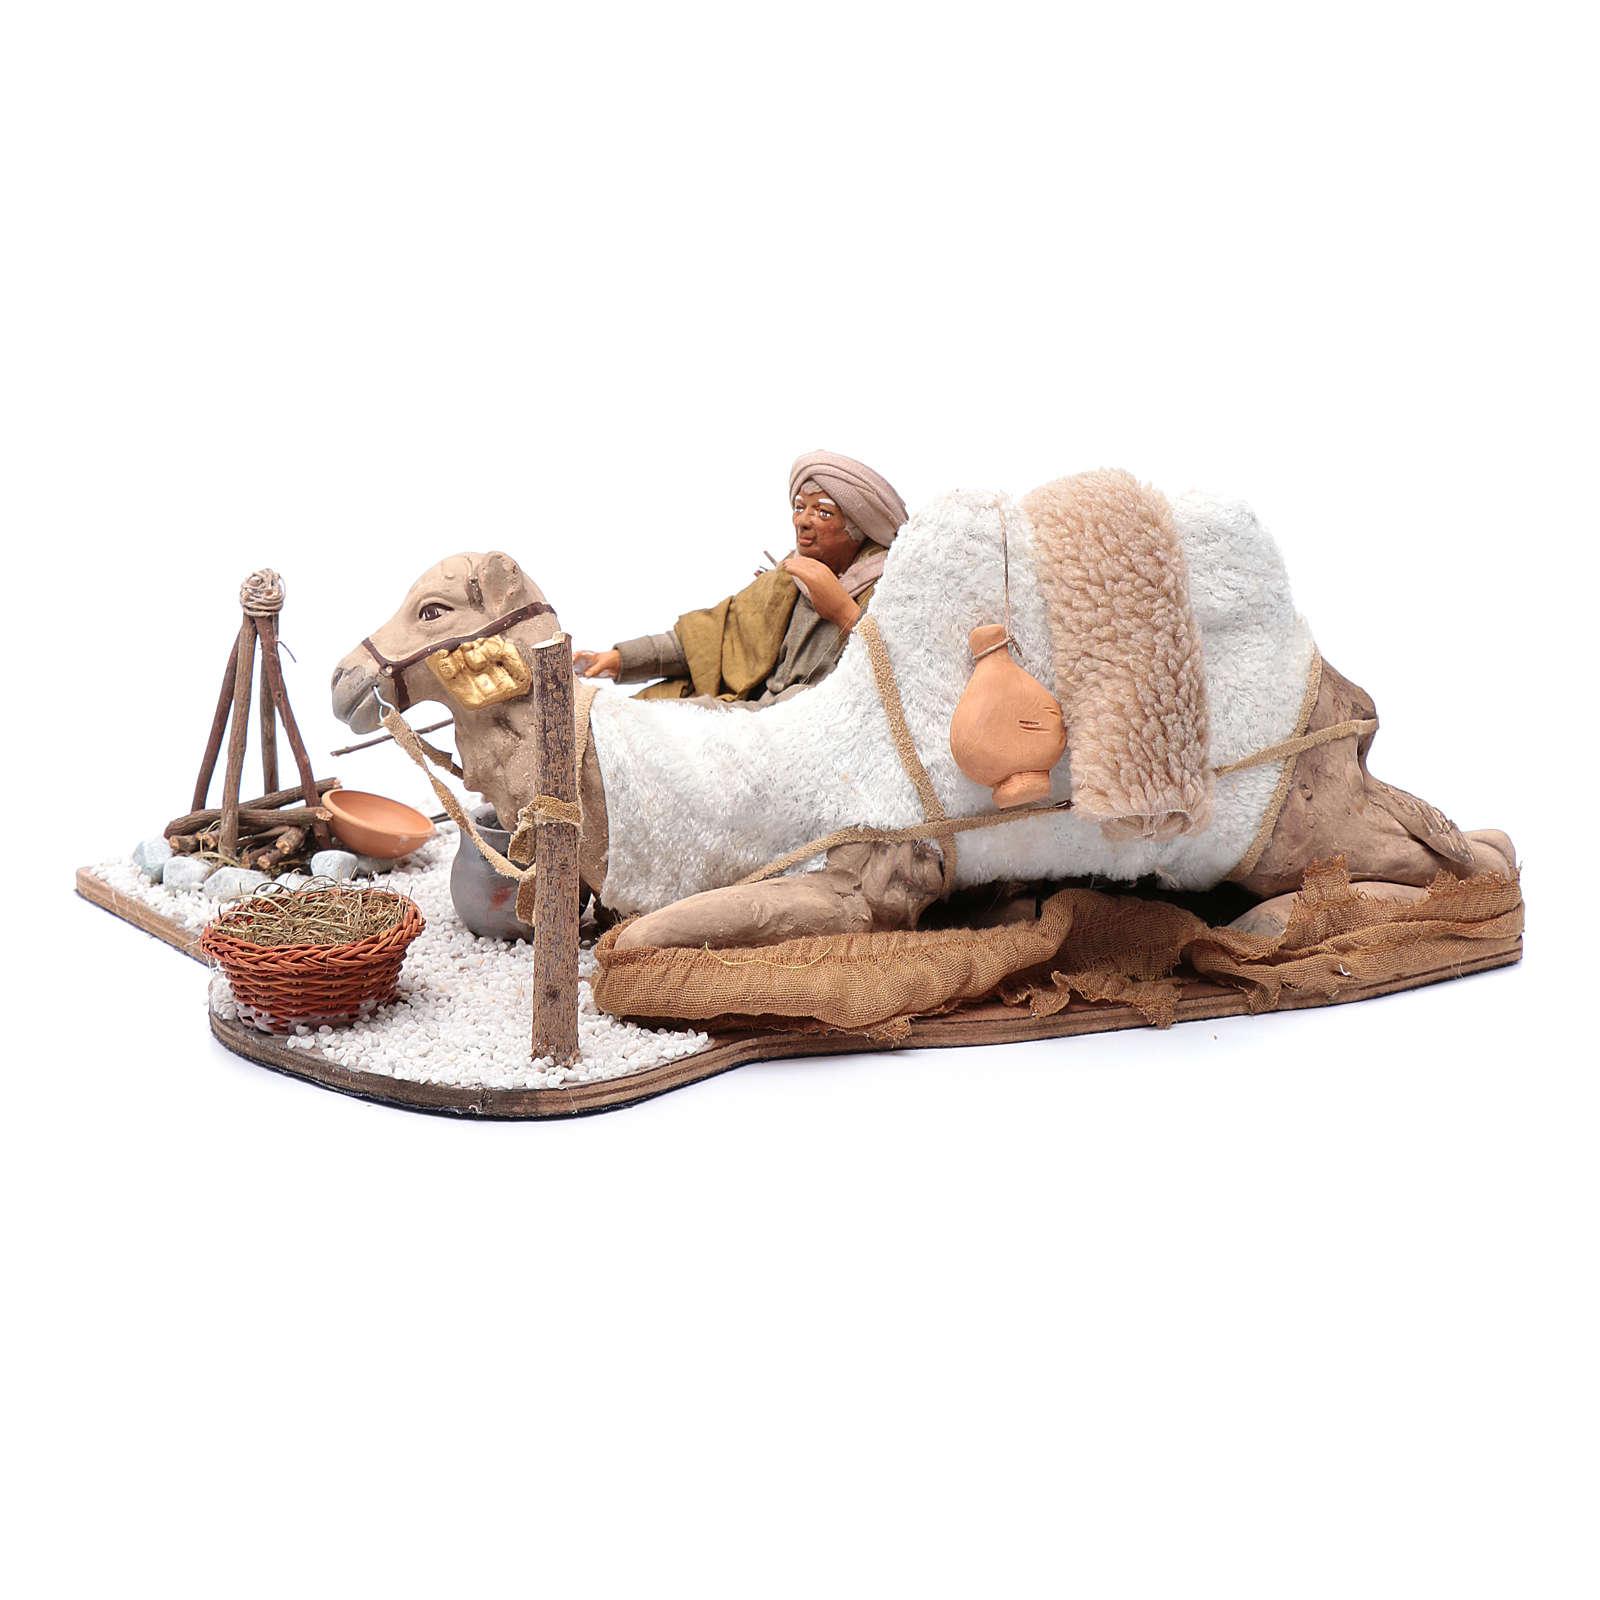 Escena en movimiento pastor con camello pesebre napolitano 24 cm 4